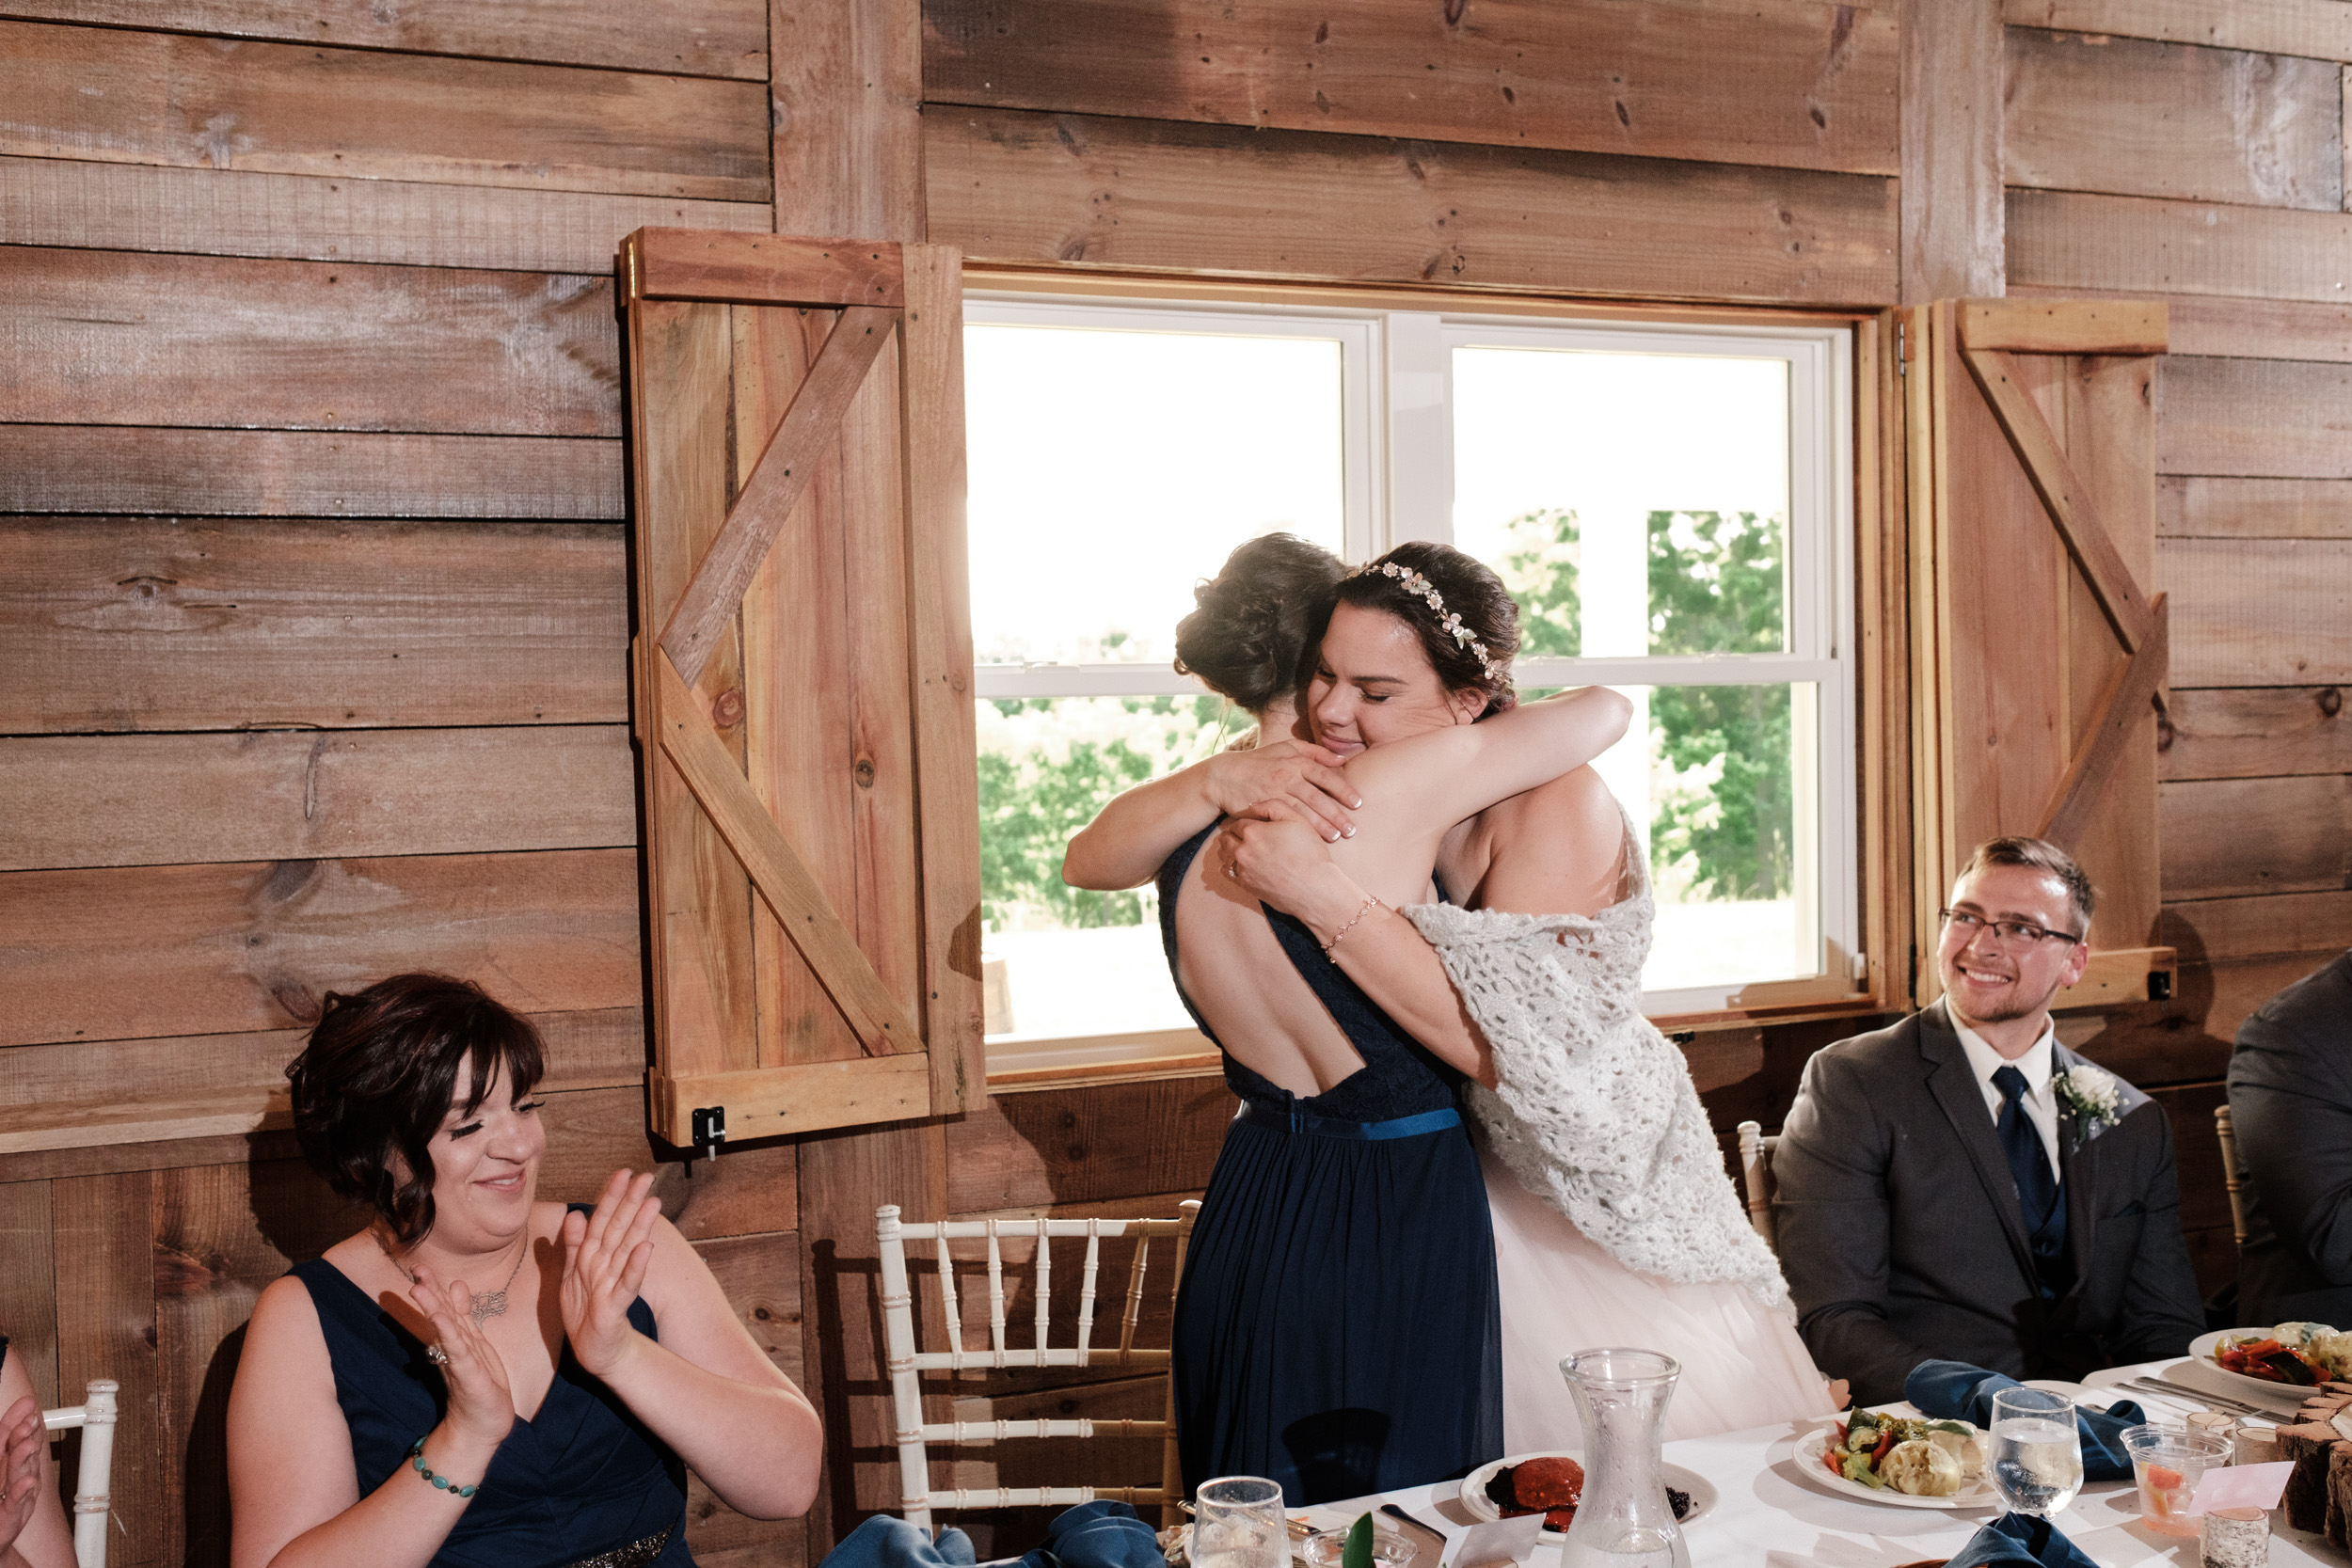 19-06-22-Ryan-Katie-The-Fields-Reserve-Wedding-62.jpg